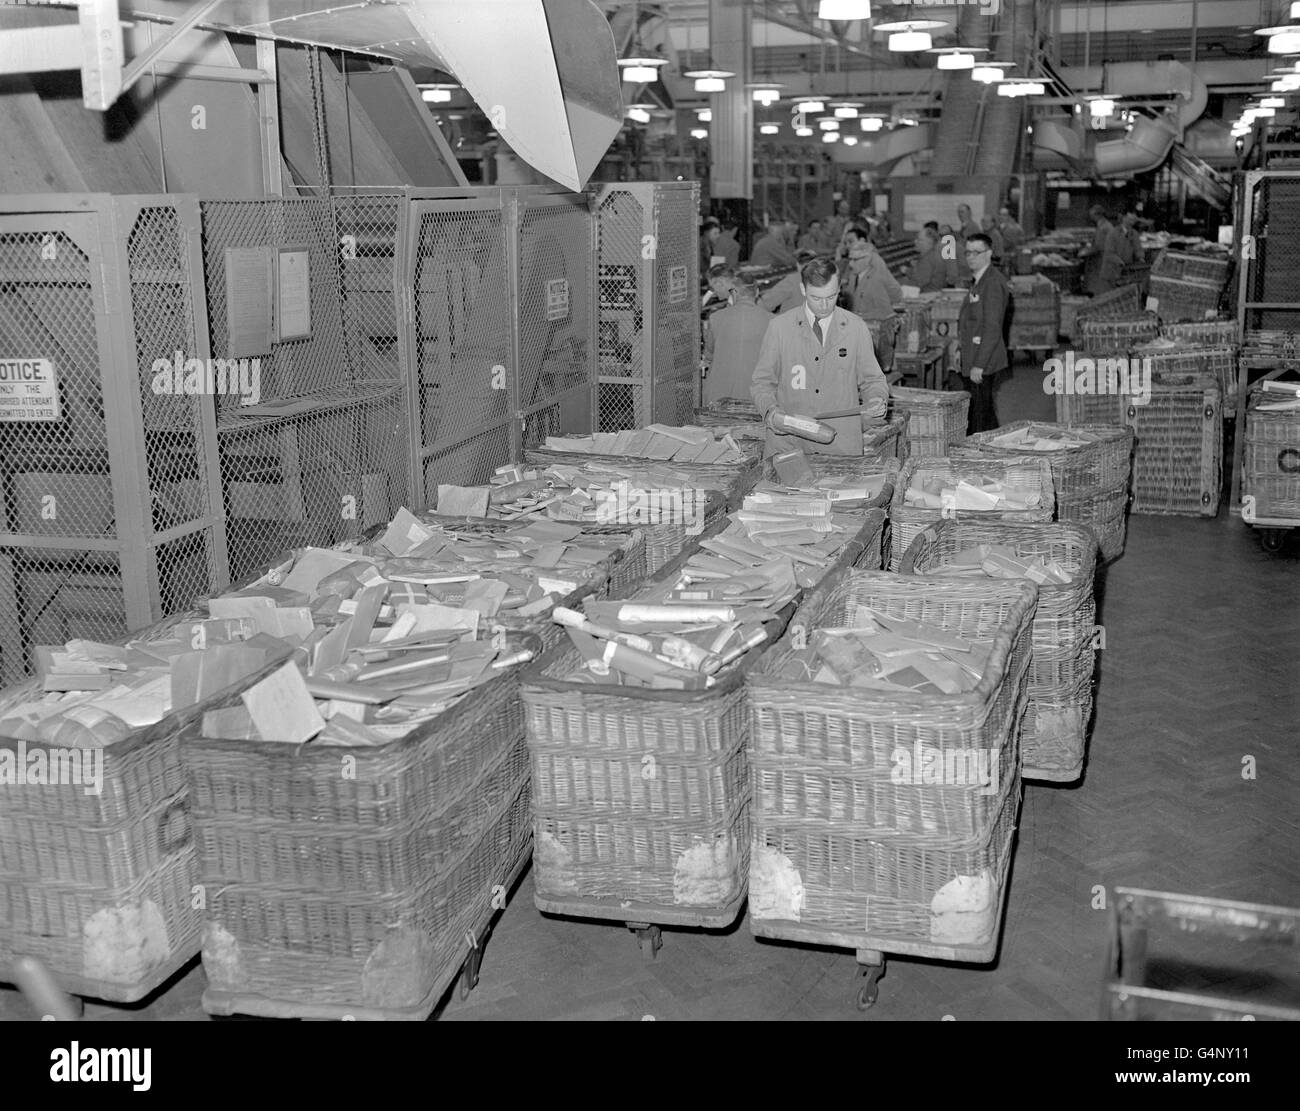 British Postal Service - Royal Mail - Mount Pleasant Sorting Office - London - Stock Image